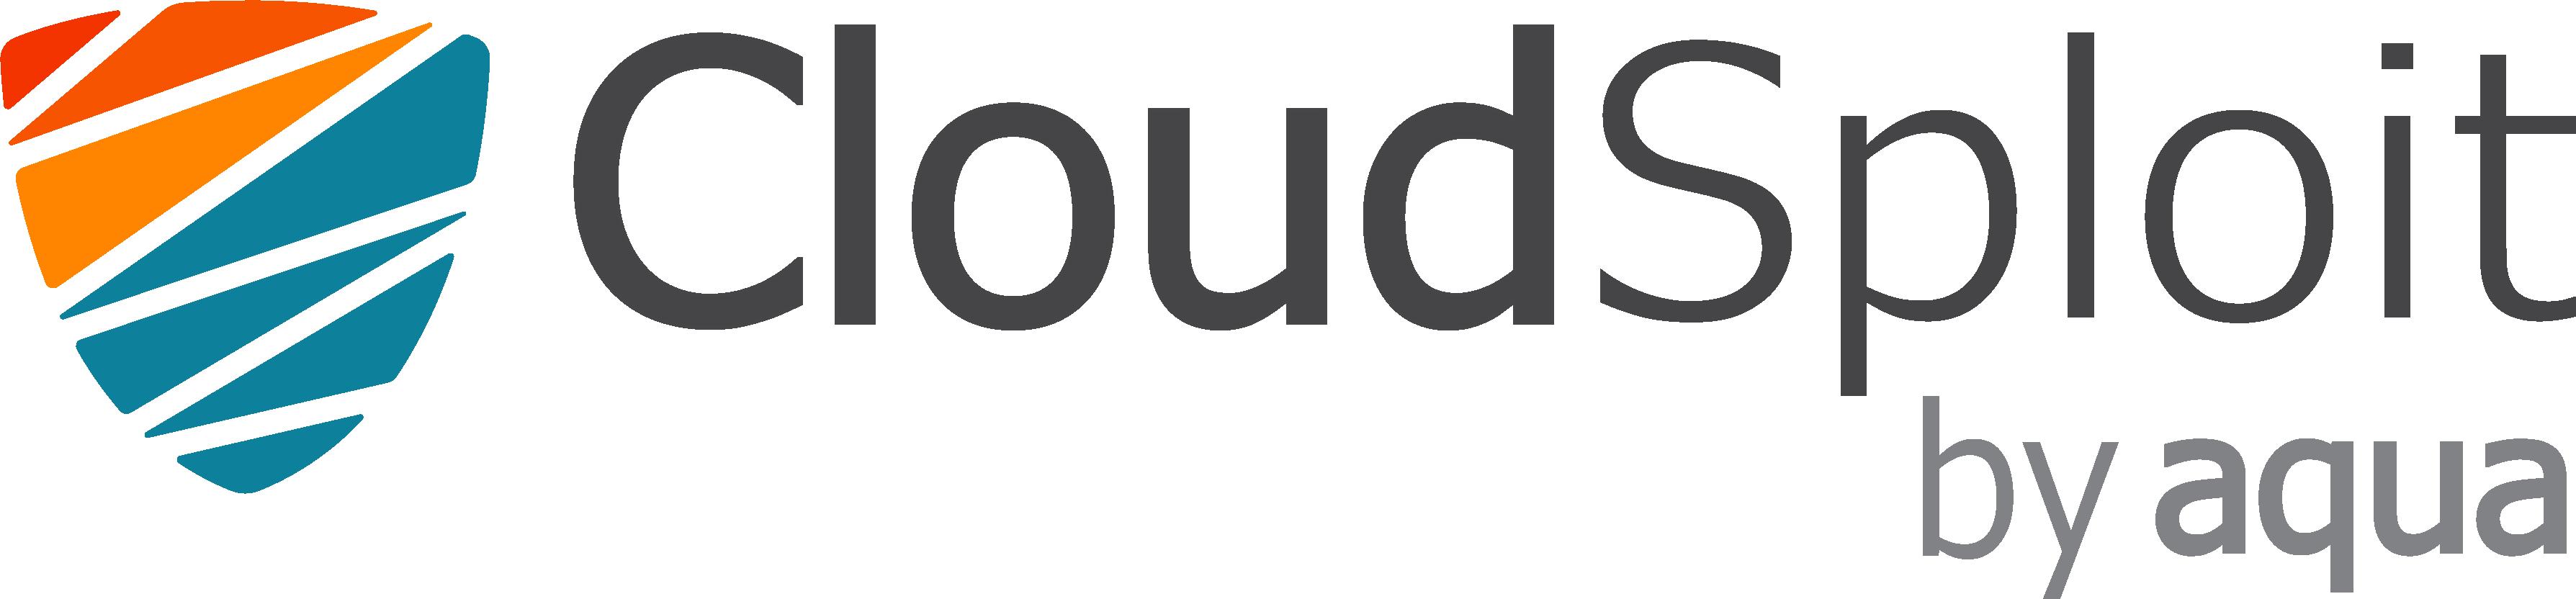 68747470733a2f2f636c6f756473706c6f69742e636f6d2f696d616765732f6c6f676f732f636c6f756473706c6f69745f62795f617175615f4130322e706e67 - CloudSploit: Ελέγχοντας την ασφάλεια του cloud